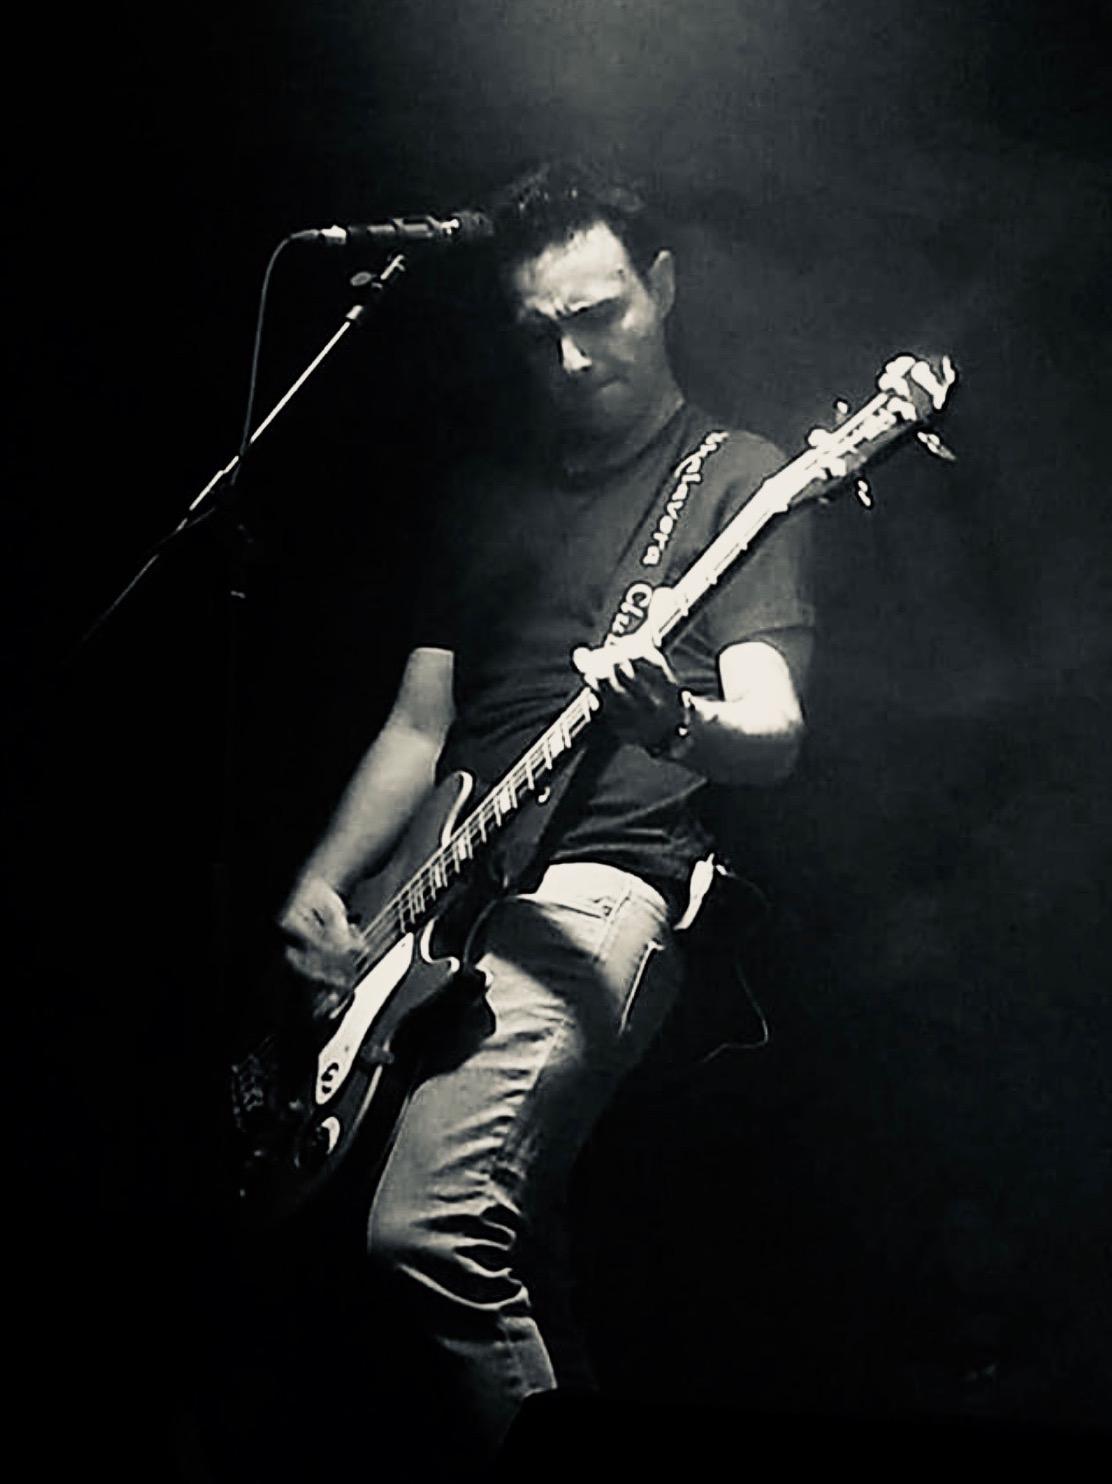 Kuzuco Rocking